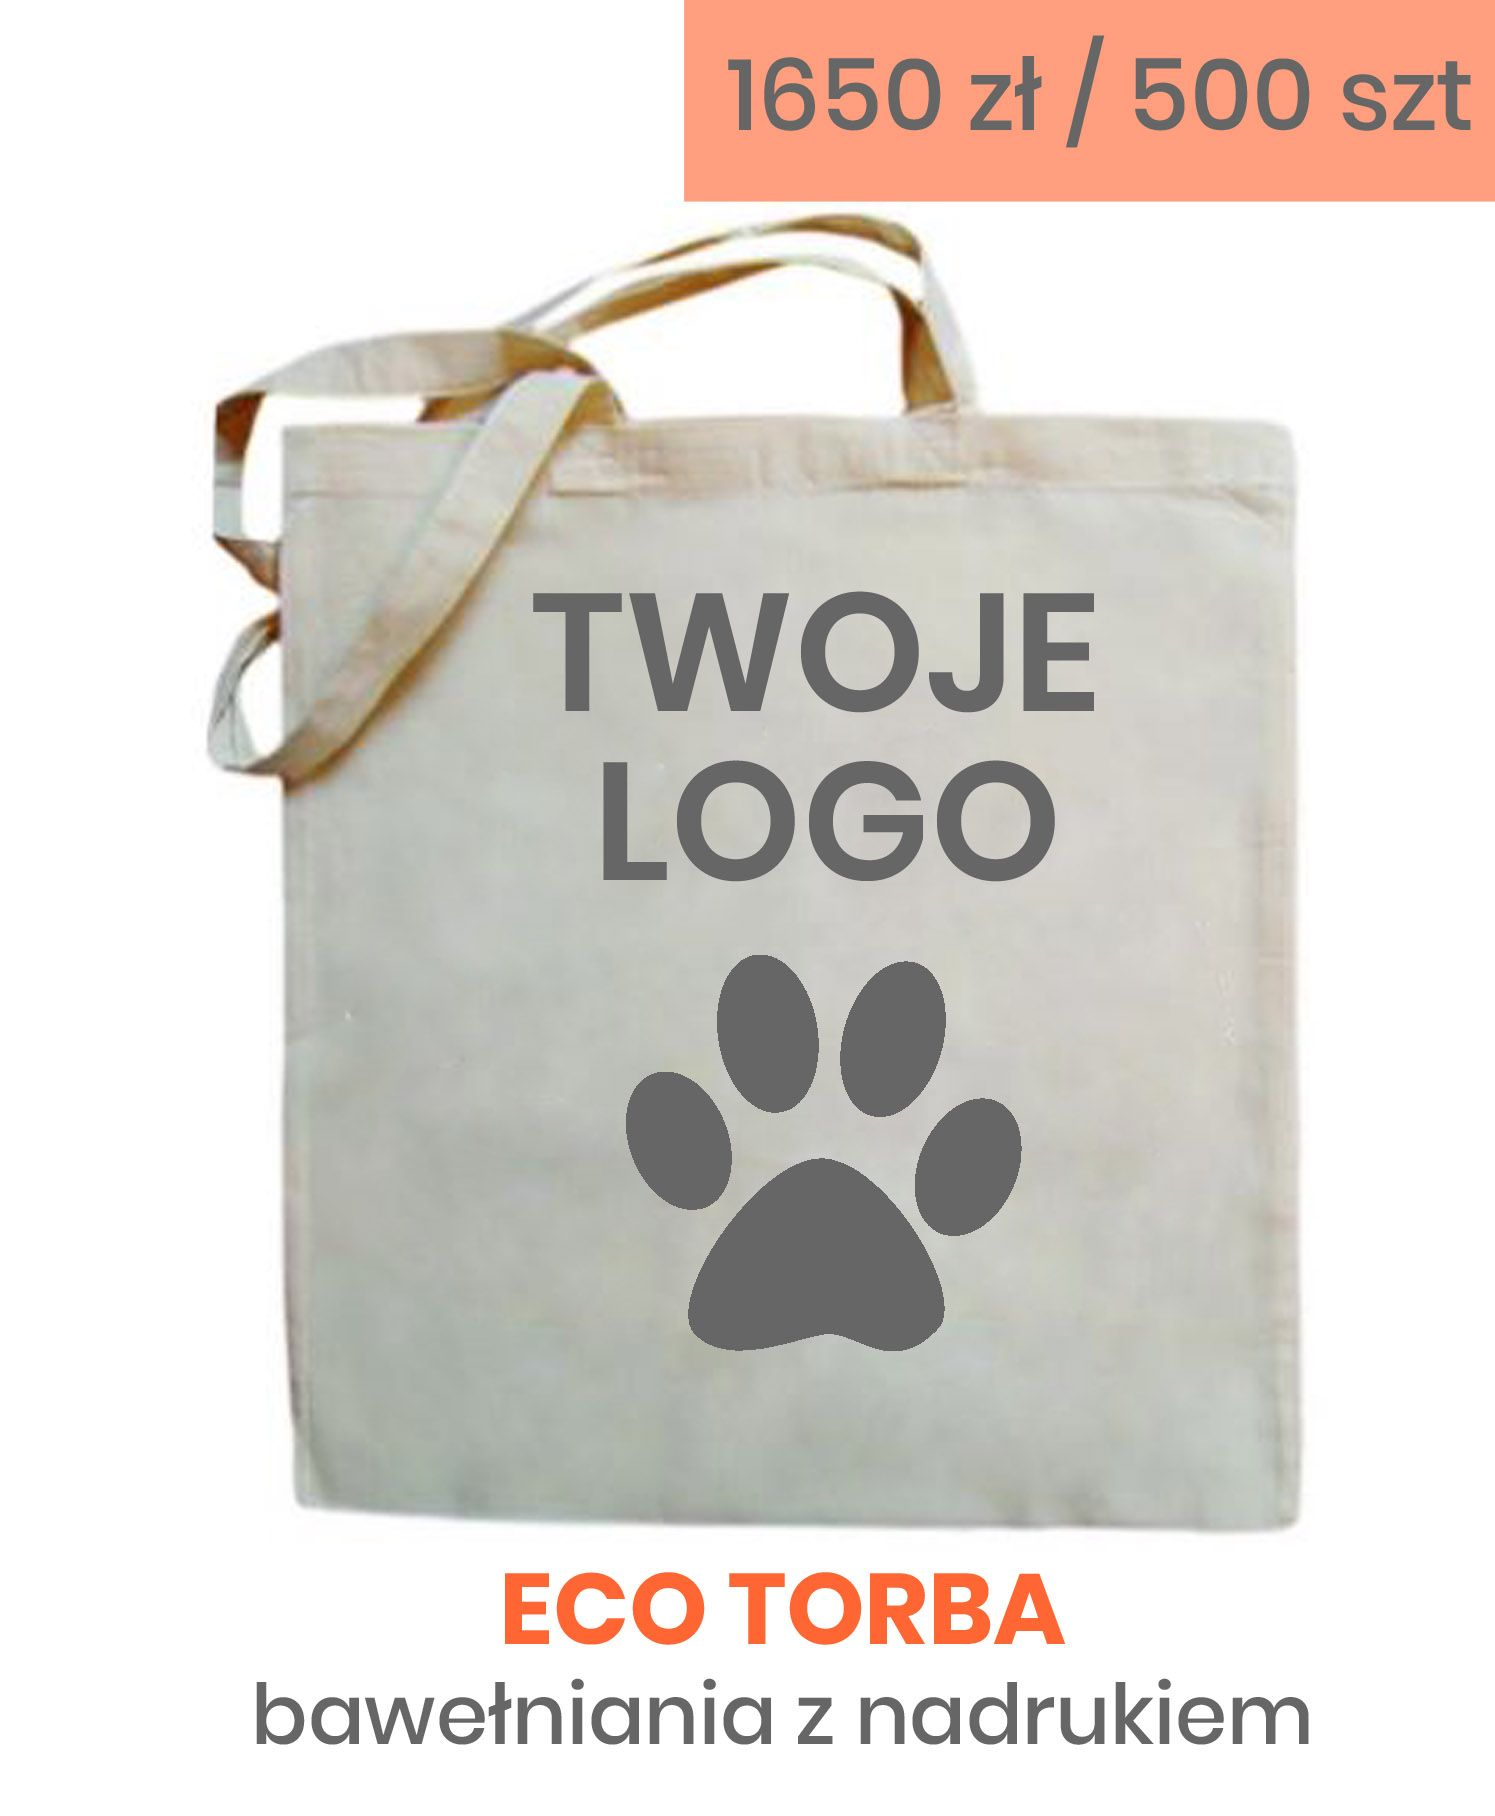 Torby Bawelniane Nadruk 1 Kolor 500 Szt Torba Torby